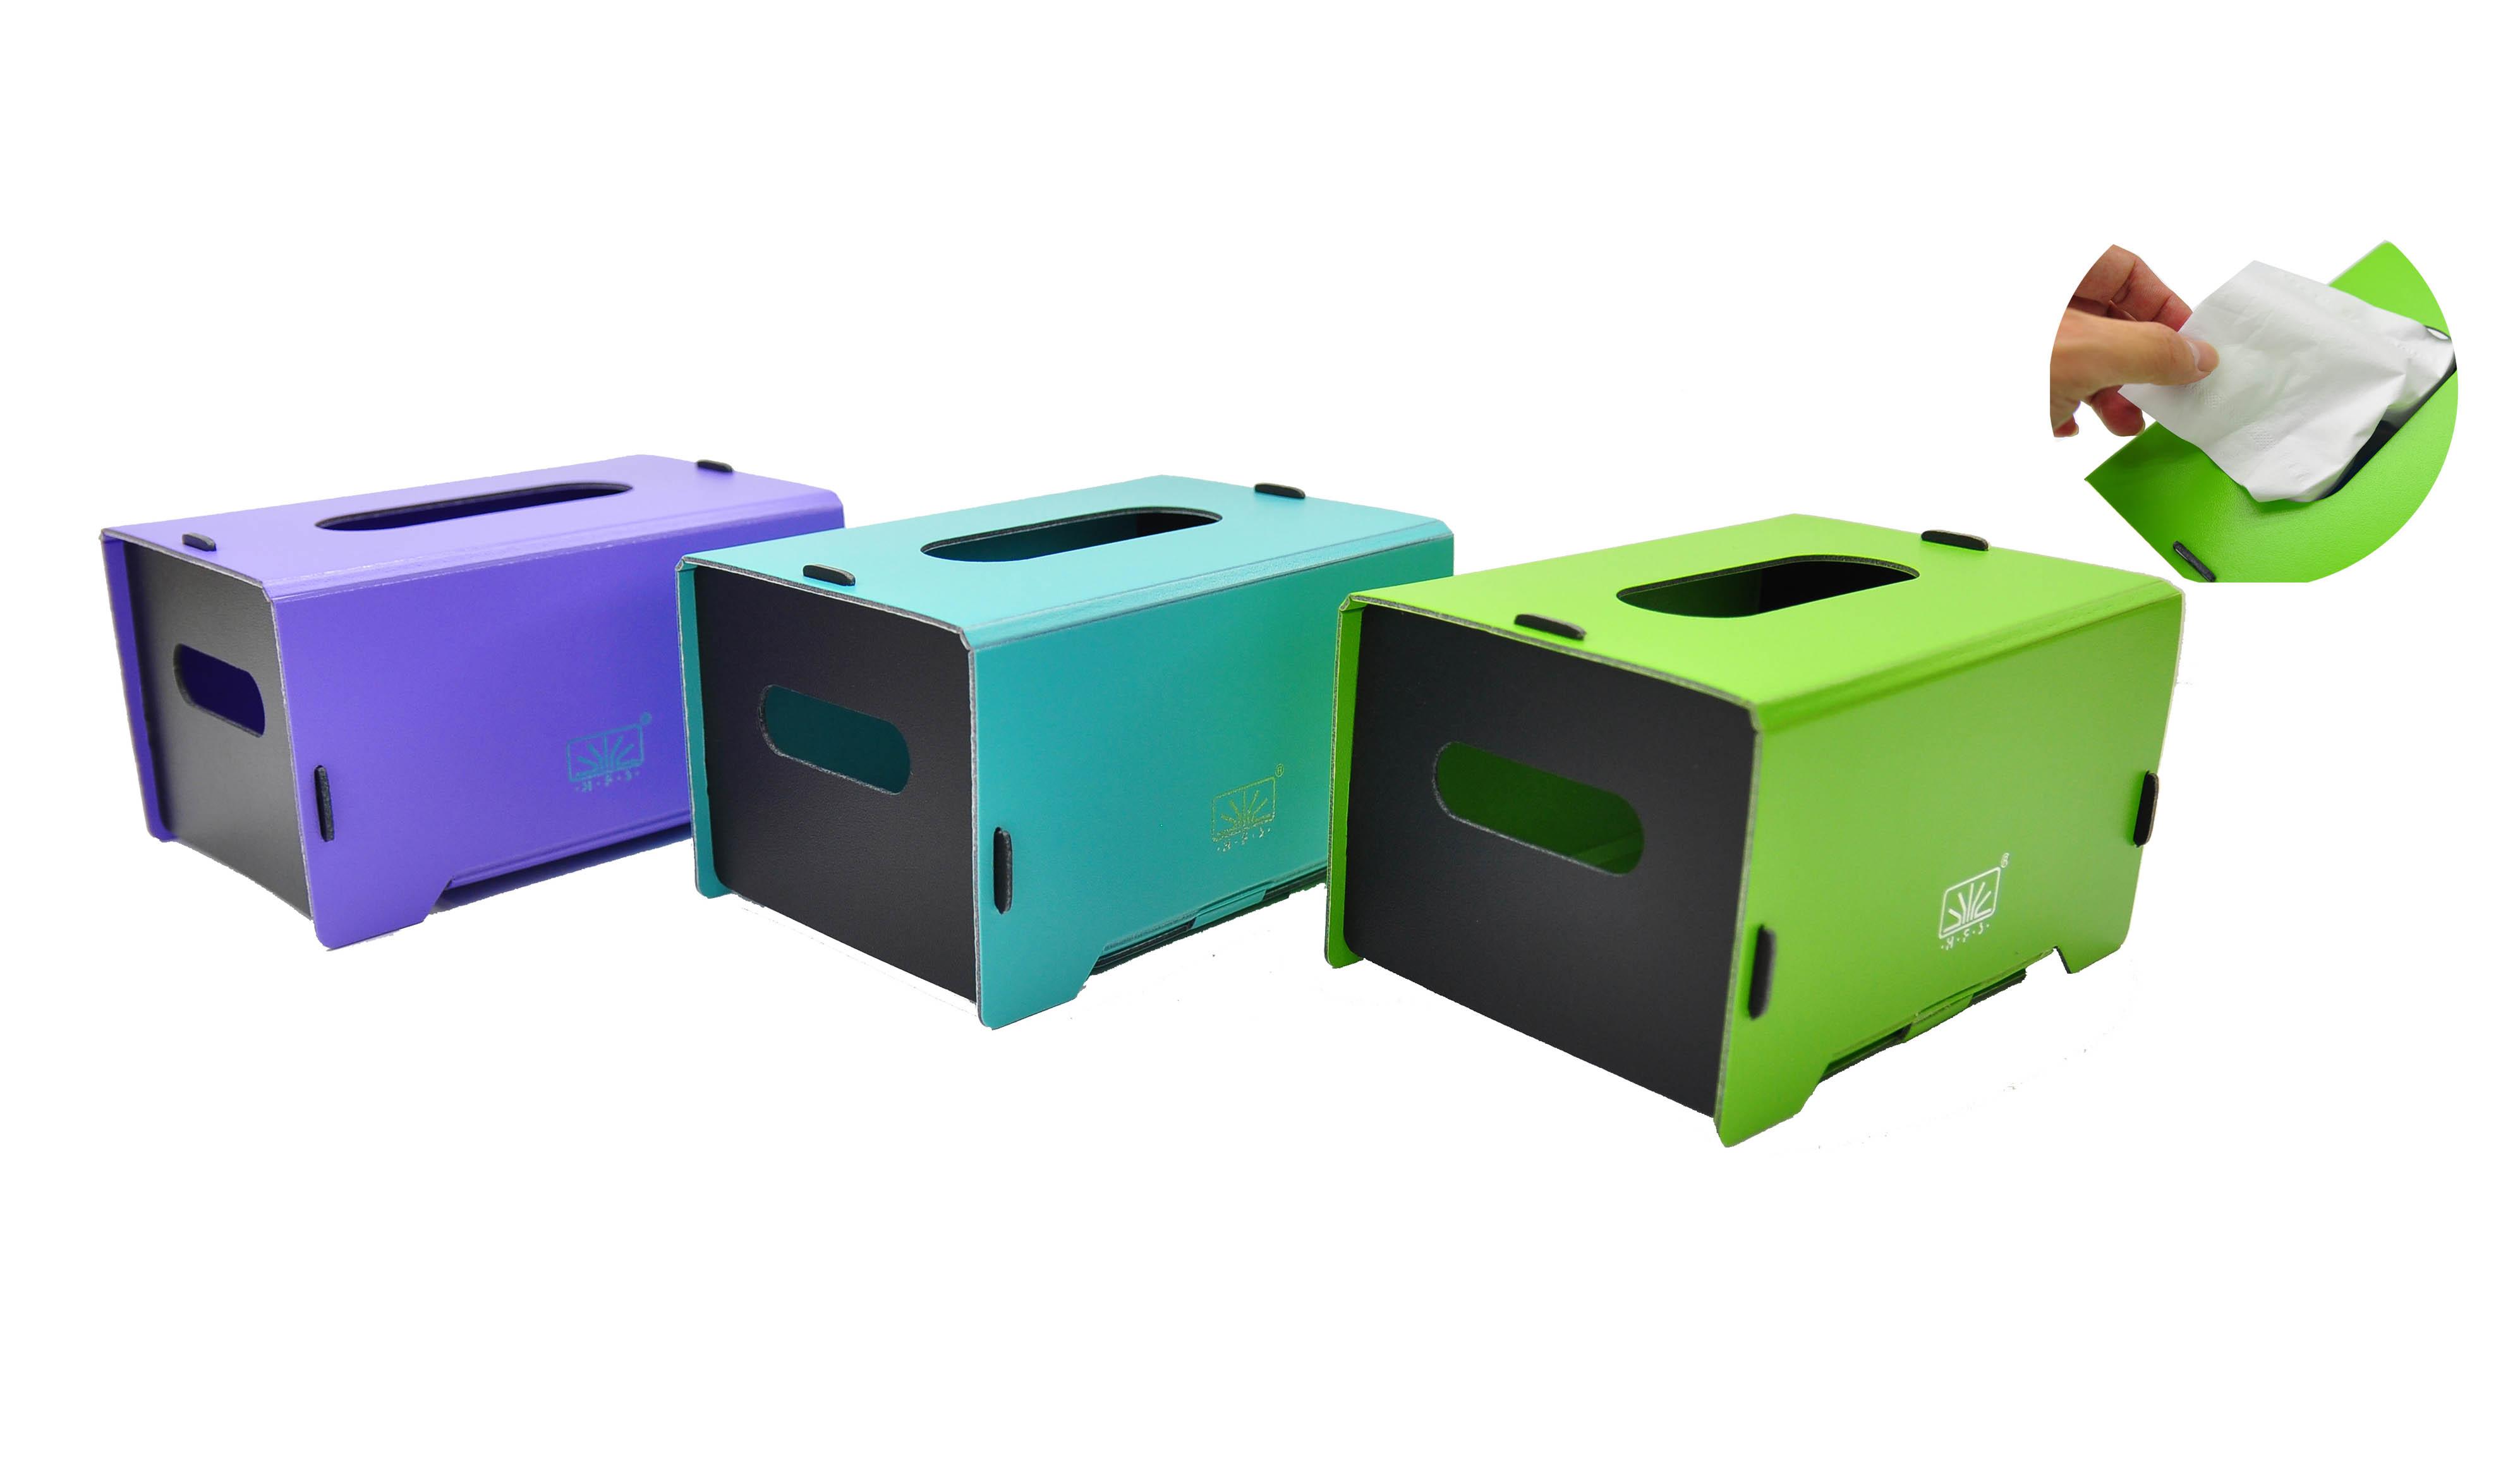 面纸盒 TISSUE BOX